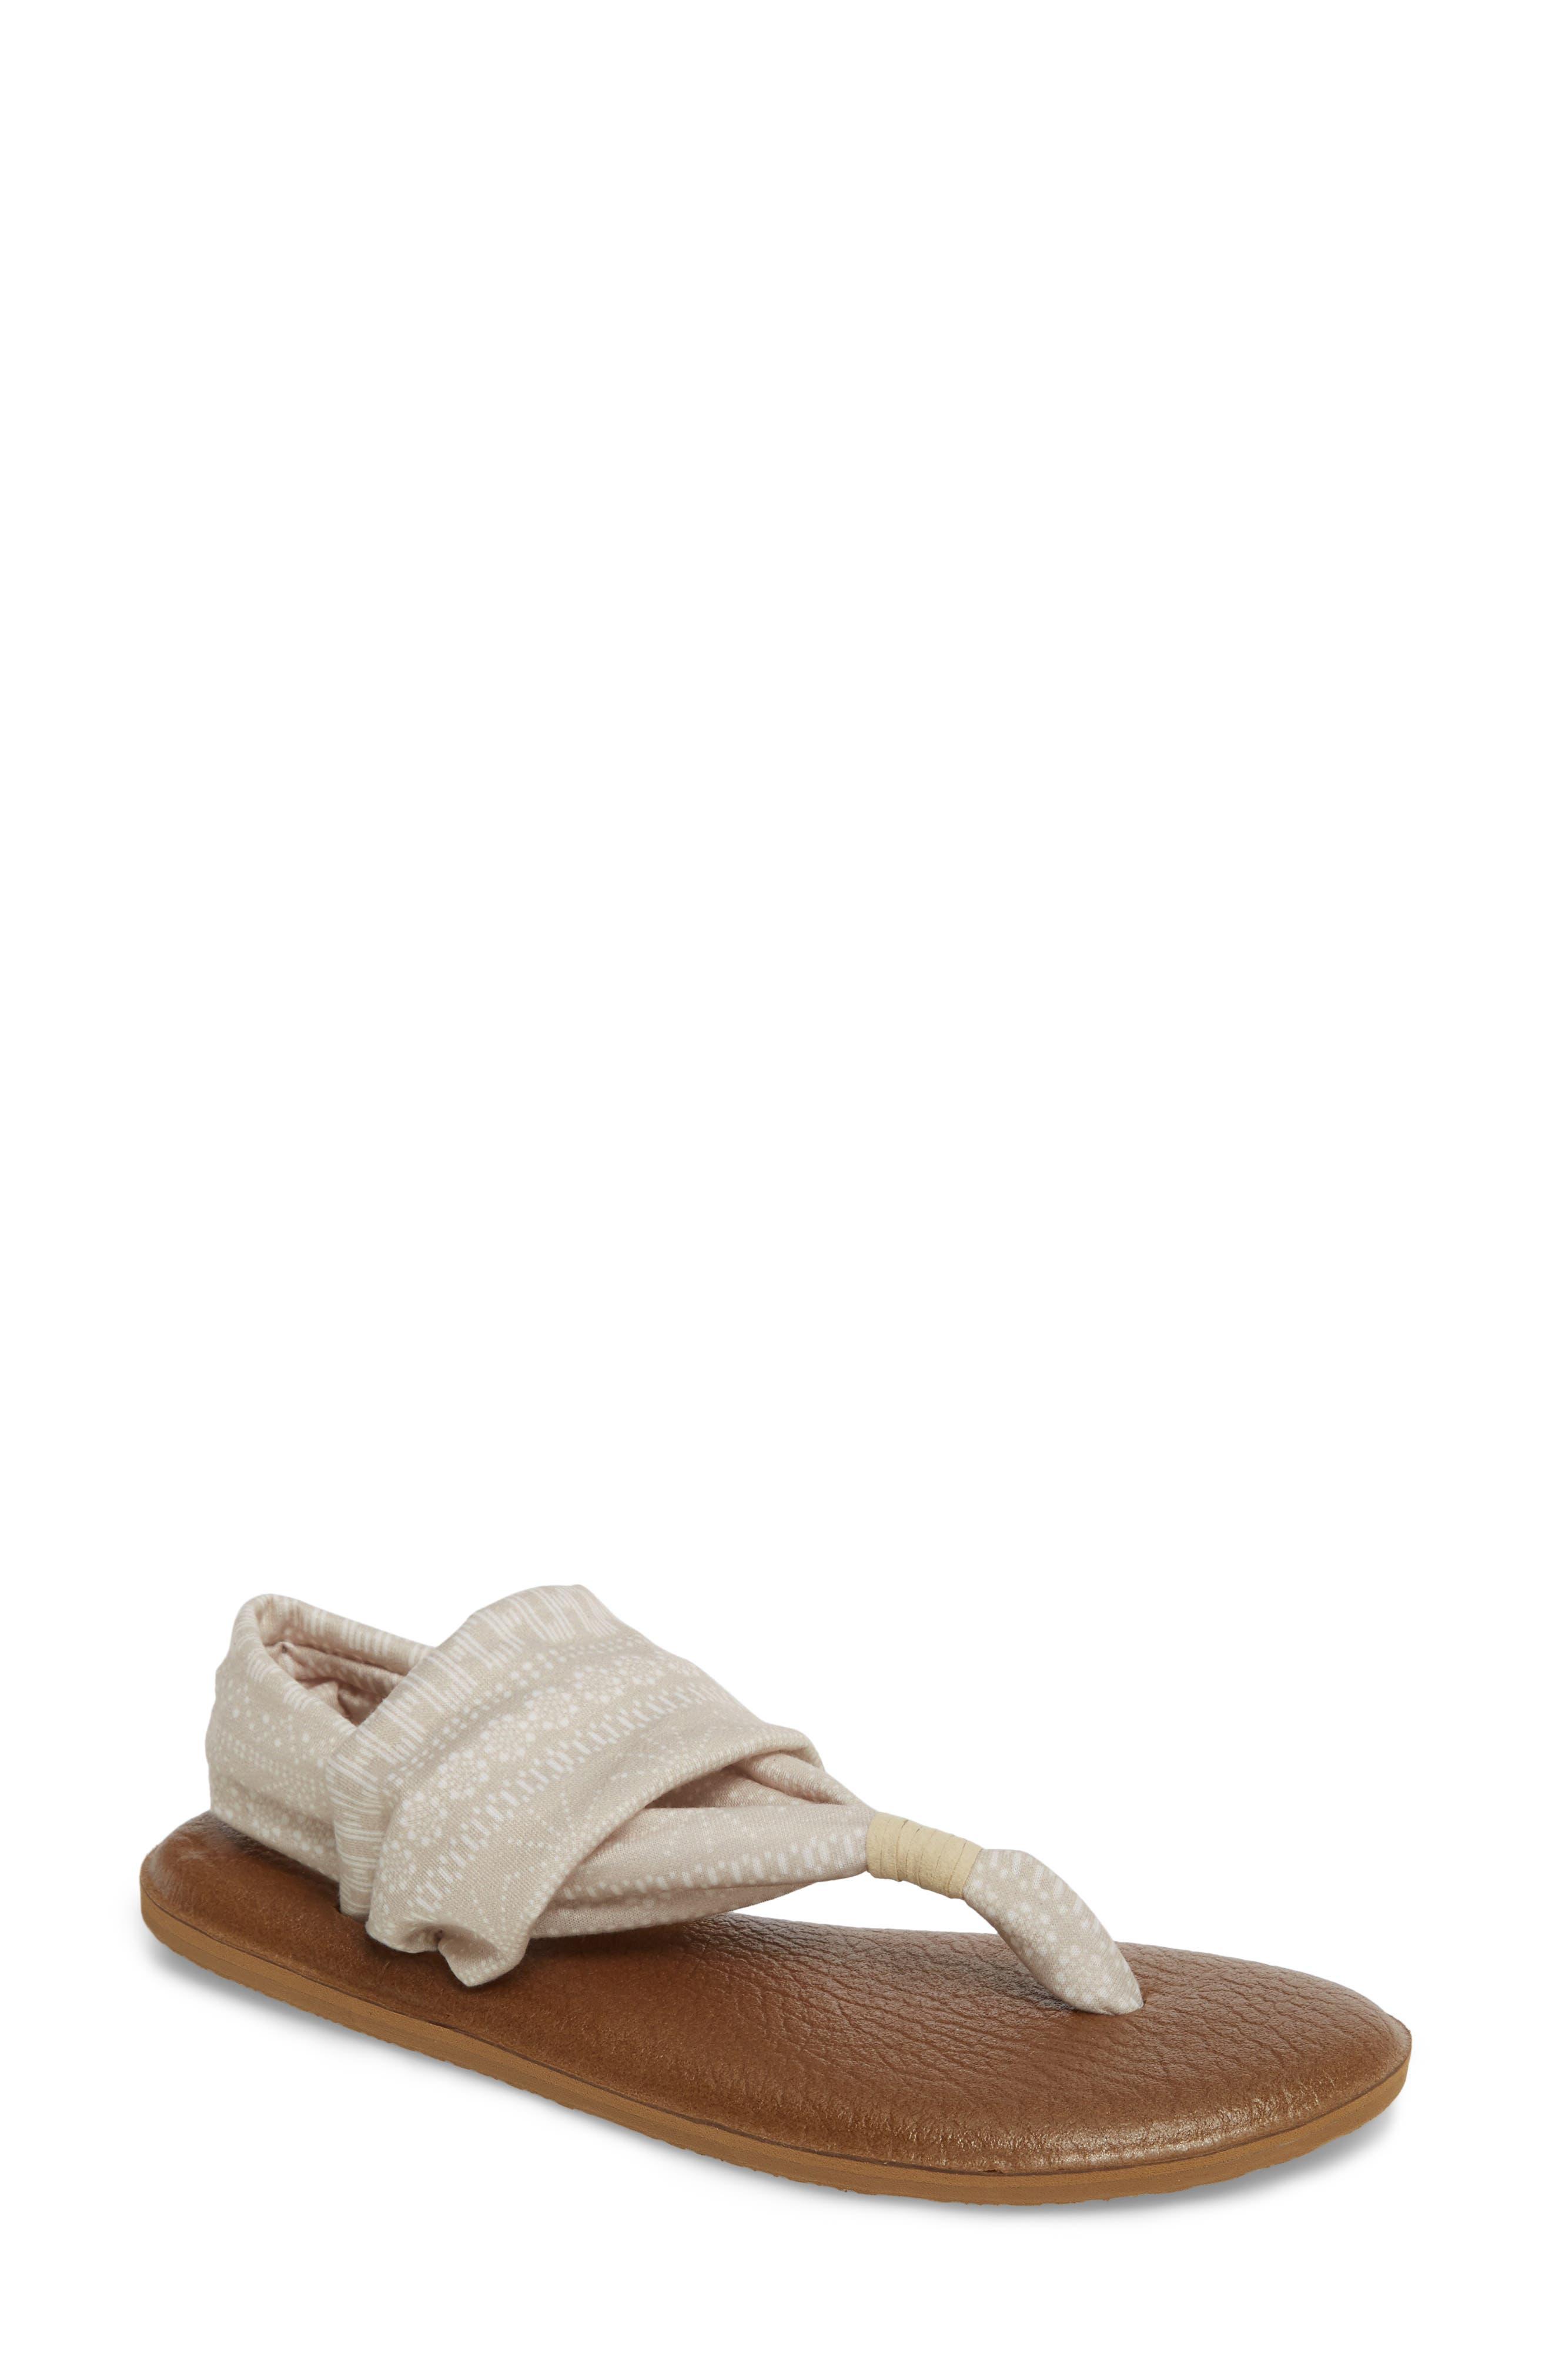 'Yoga Sling 2' Sandal,                             Main thumbnail 4, color,